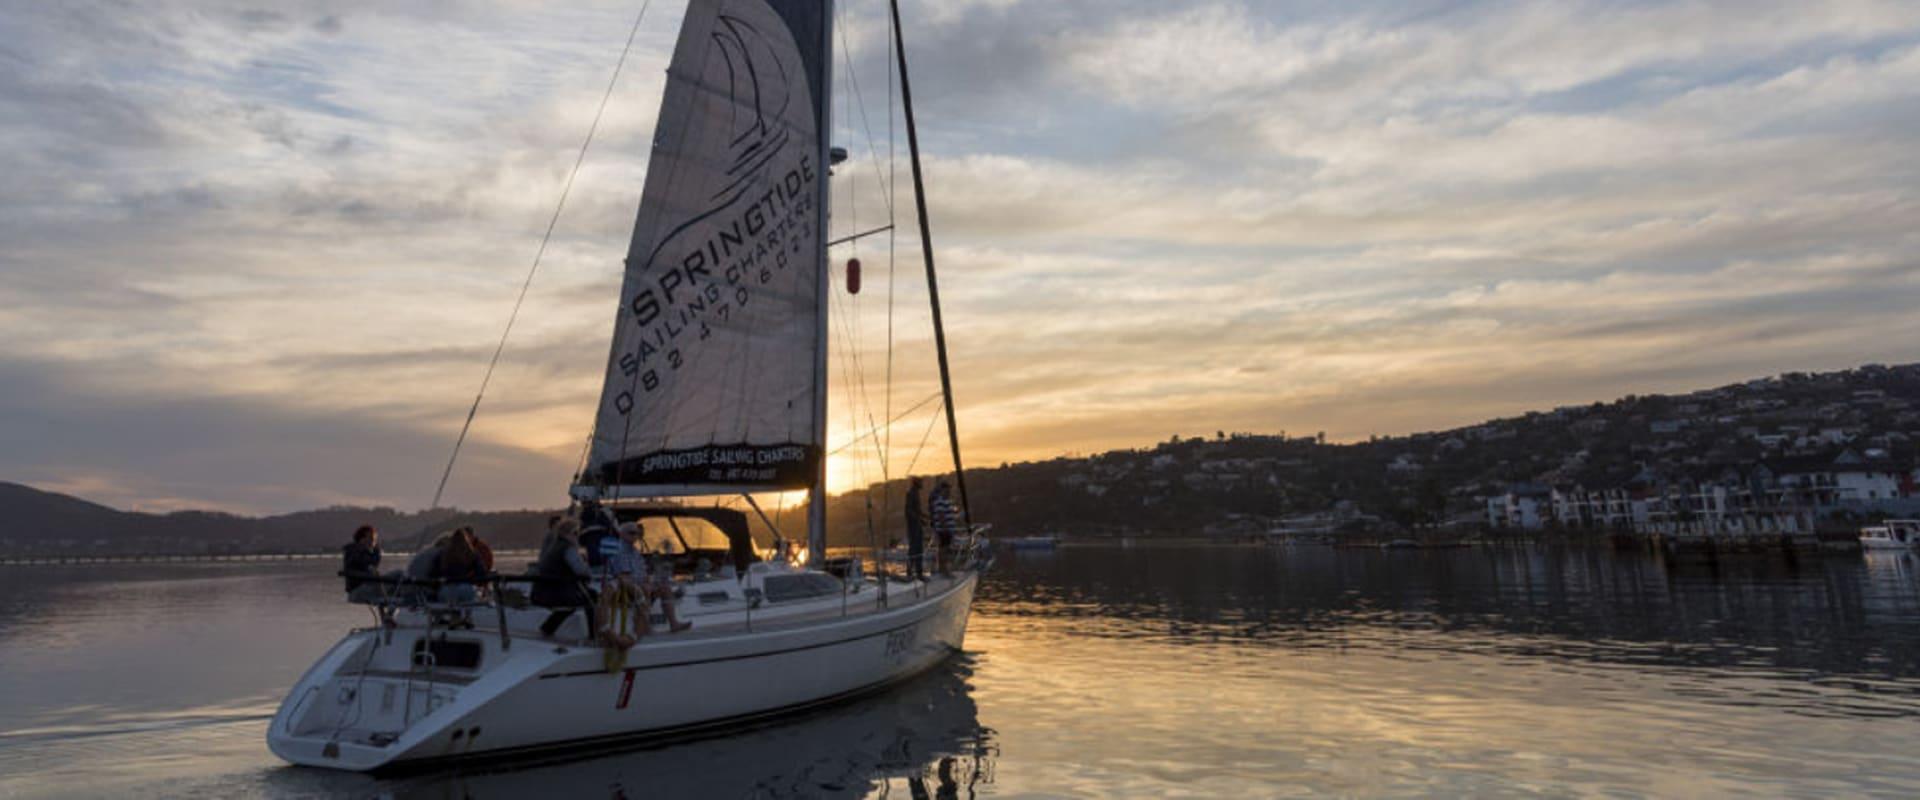 Enjoy a boat cruise on the Knysna Lagoon